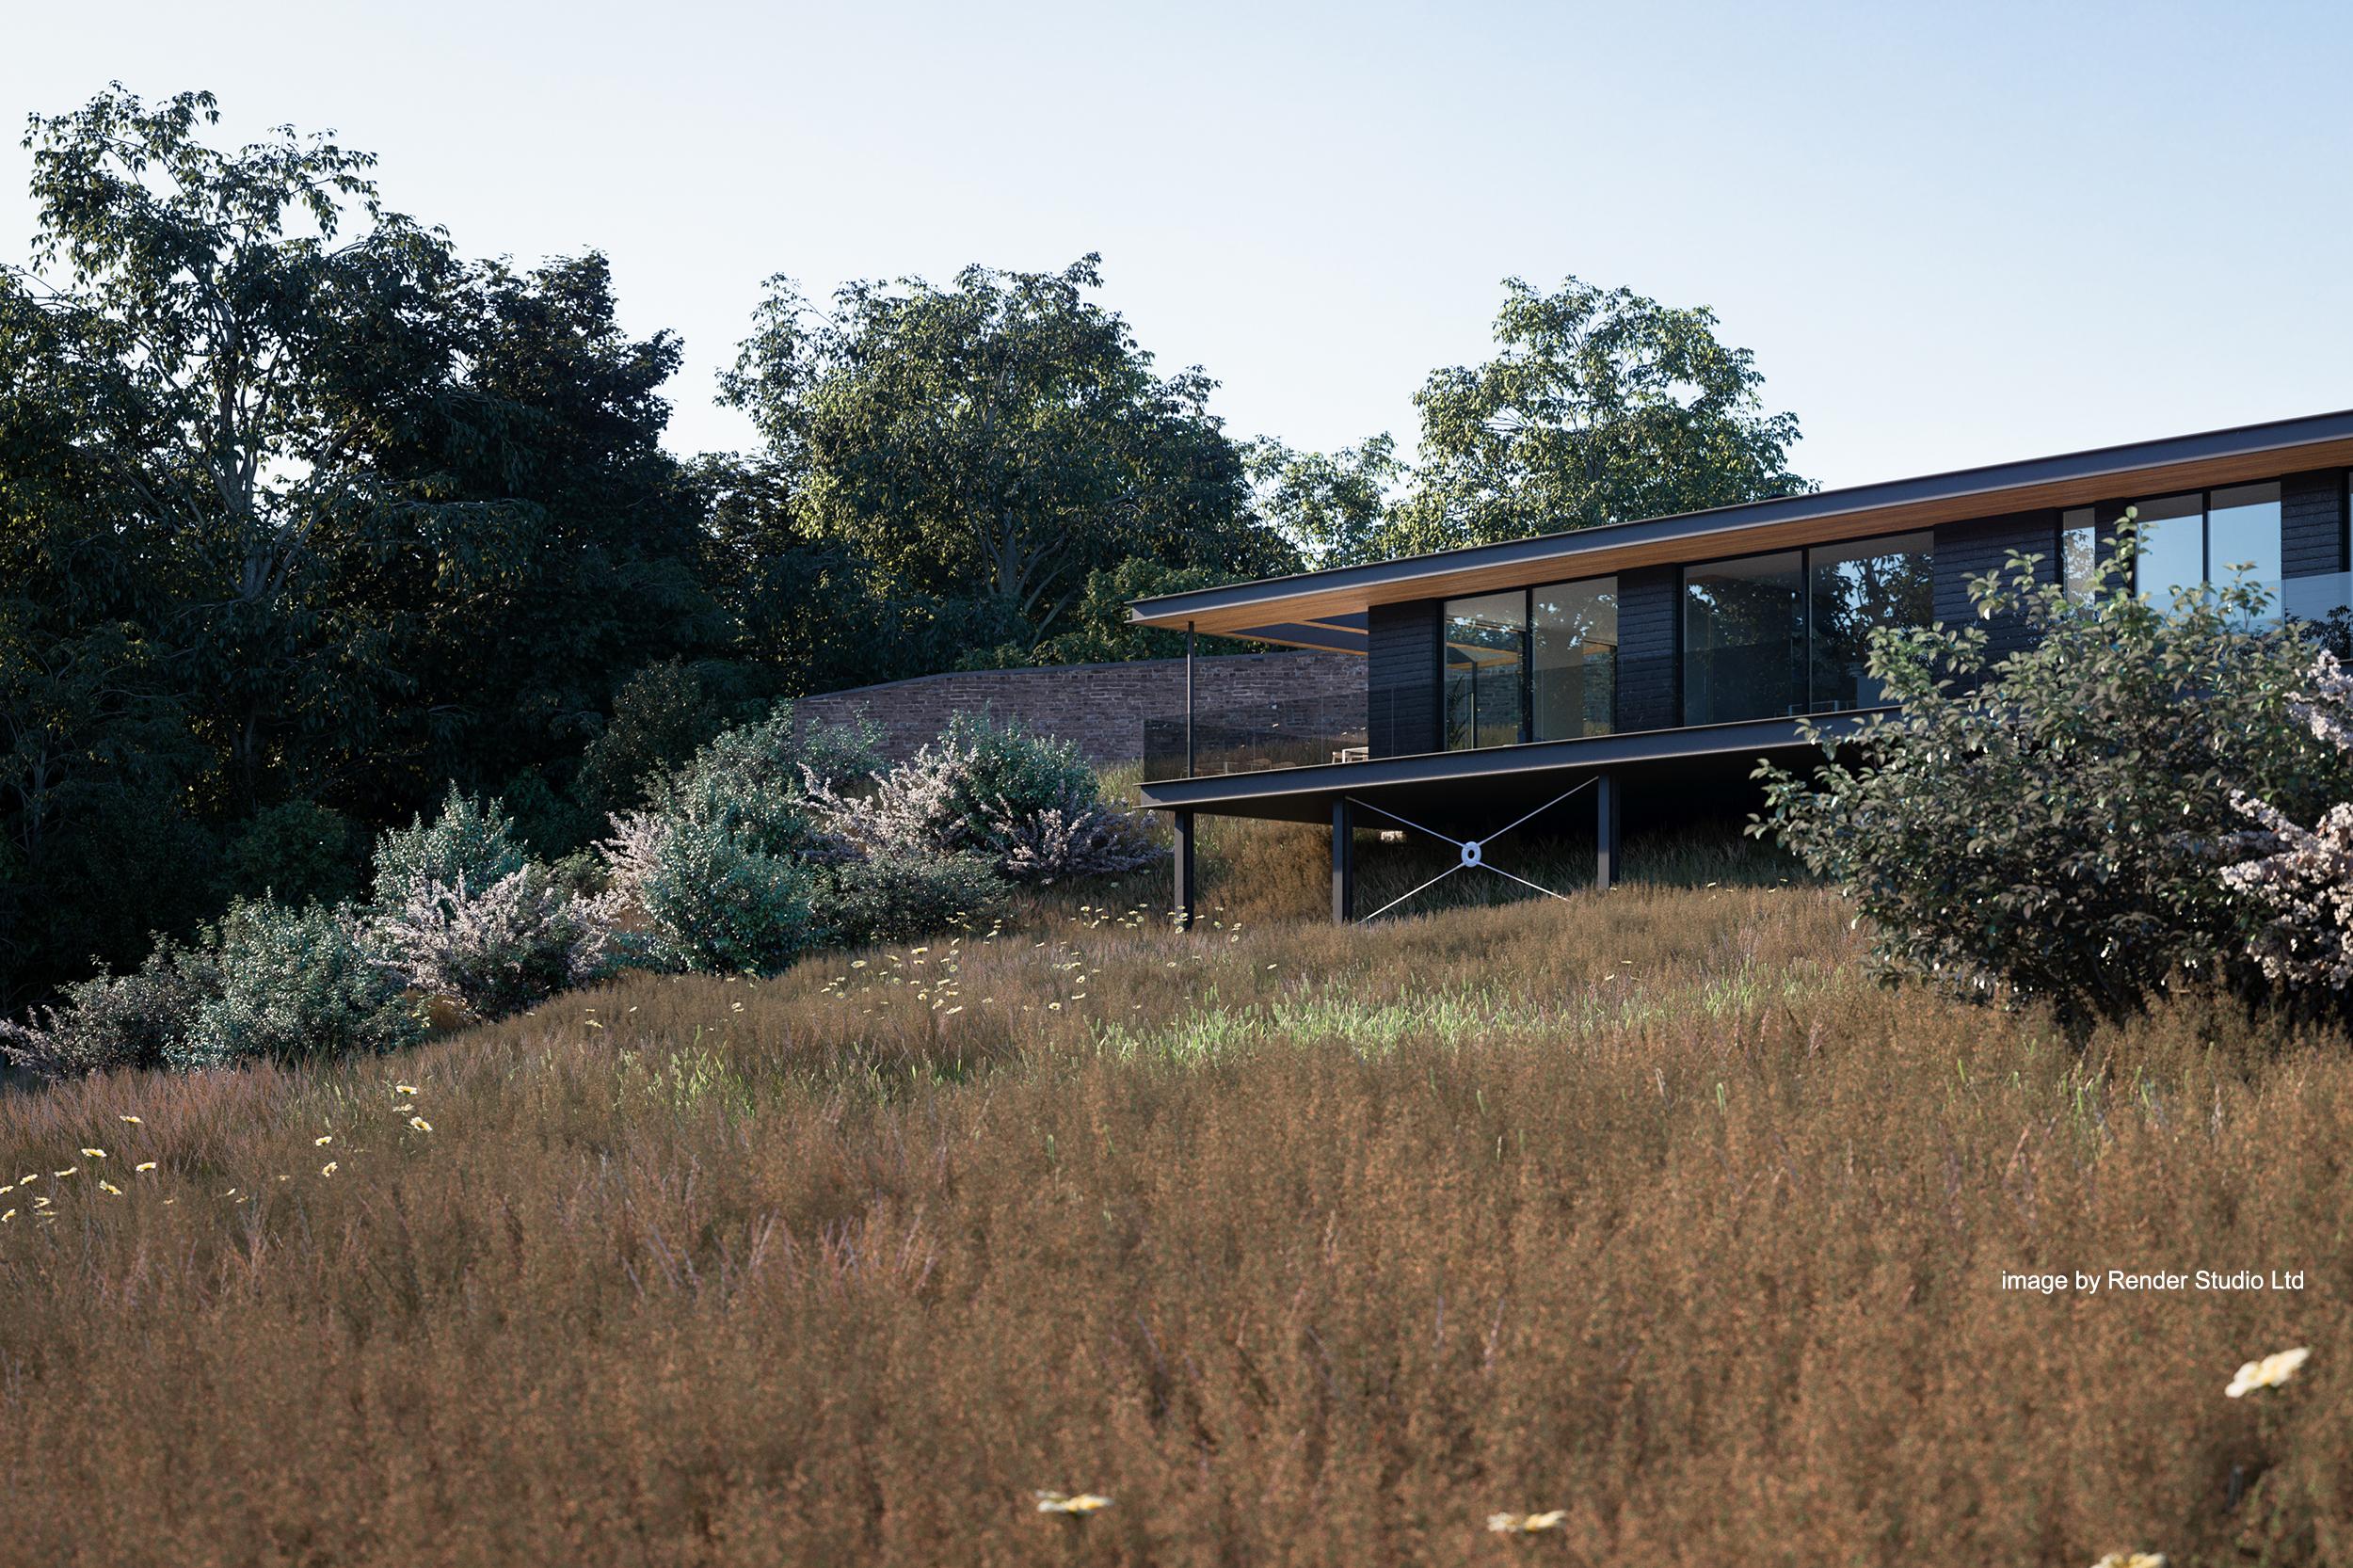 house, cantilever, bespoke, raised, timber, glass, landscape